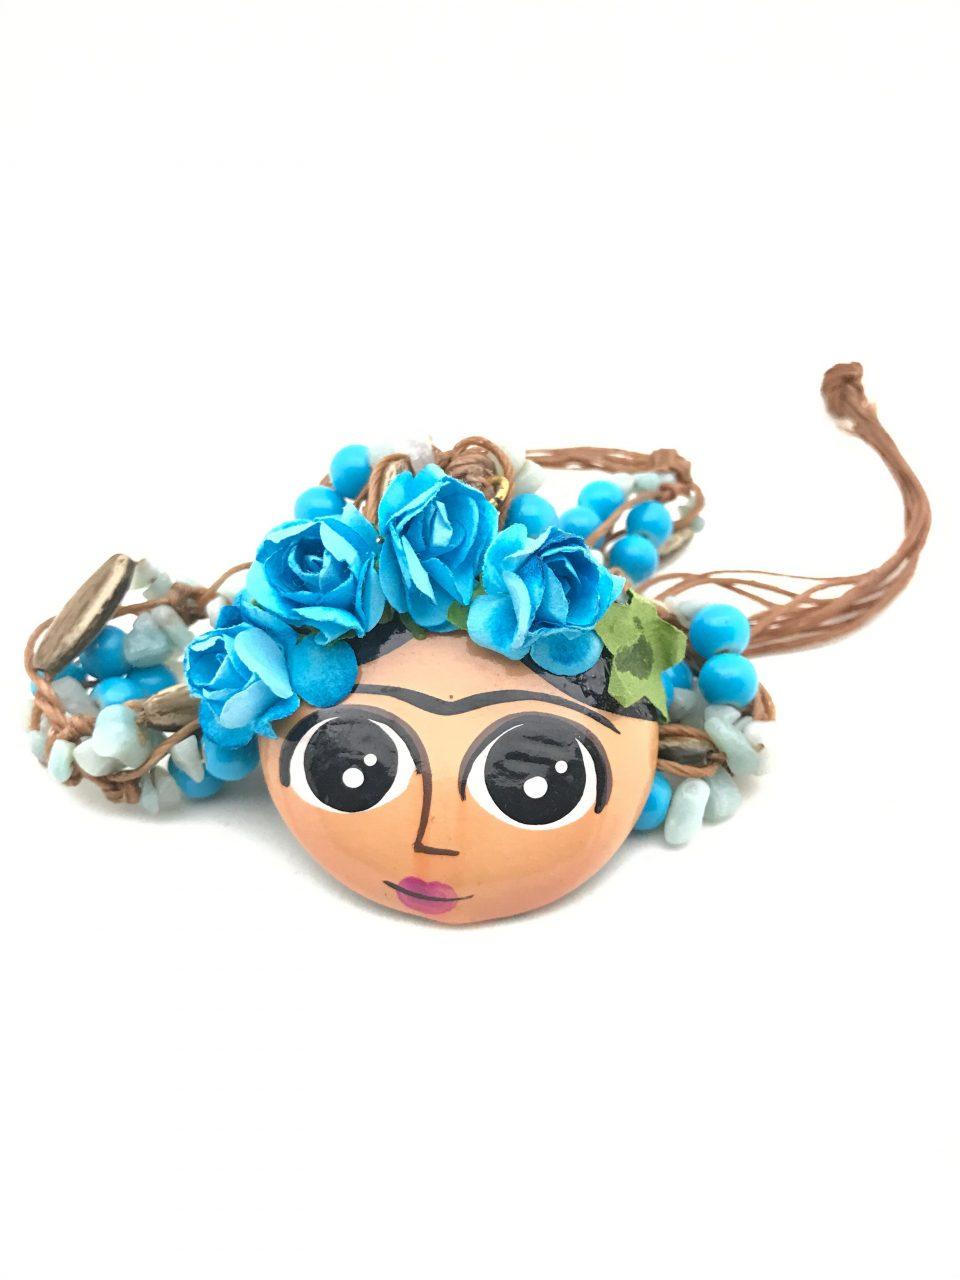 Frida Kahlo Necklace (12)